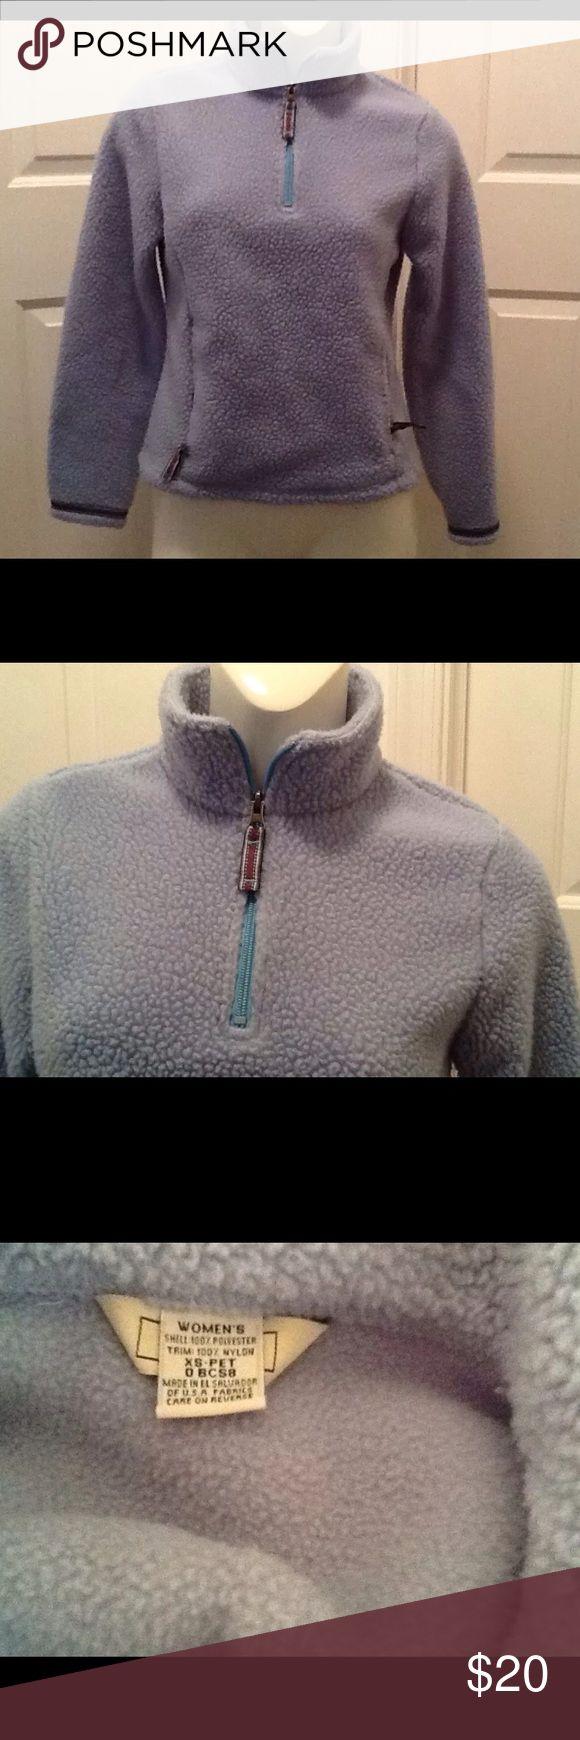 L.L. Bean Polartec Fuzzy 1/4 Zip Pullover L.L. Bean Polertec Fuzzy 1/4 Zip Pullover Sweatshirt. Women's Size XS Petite. L.L. Bean Tops Sweatshirts & Hoodies